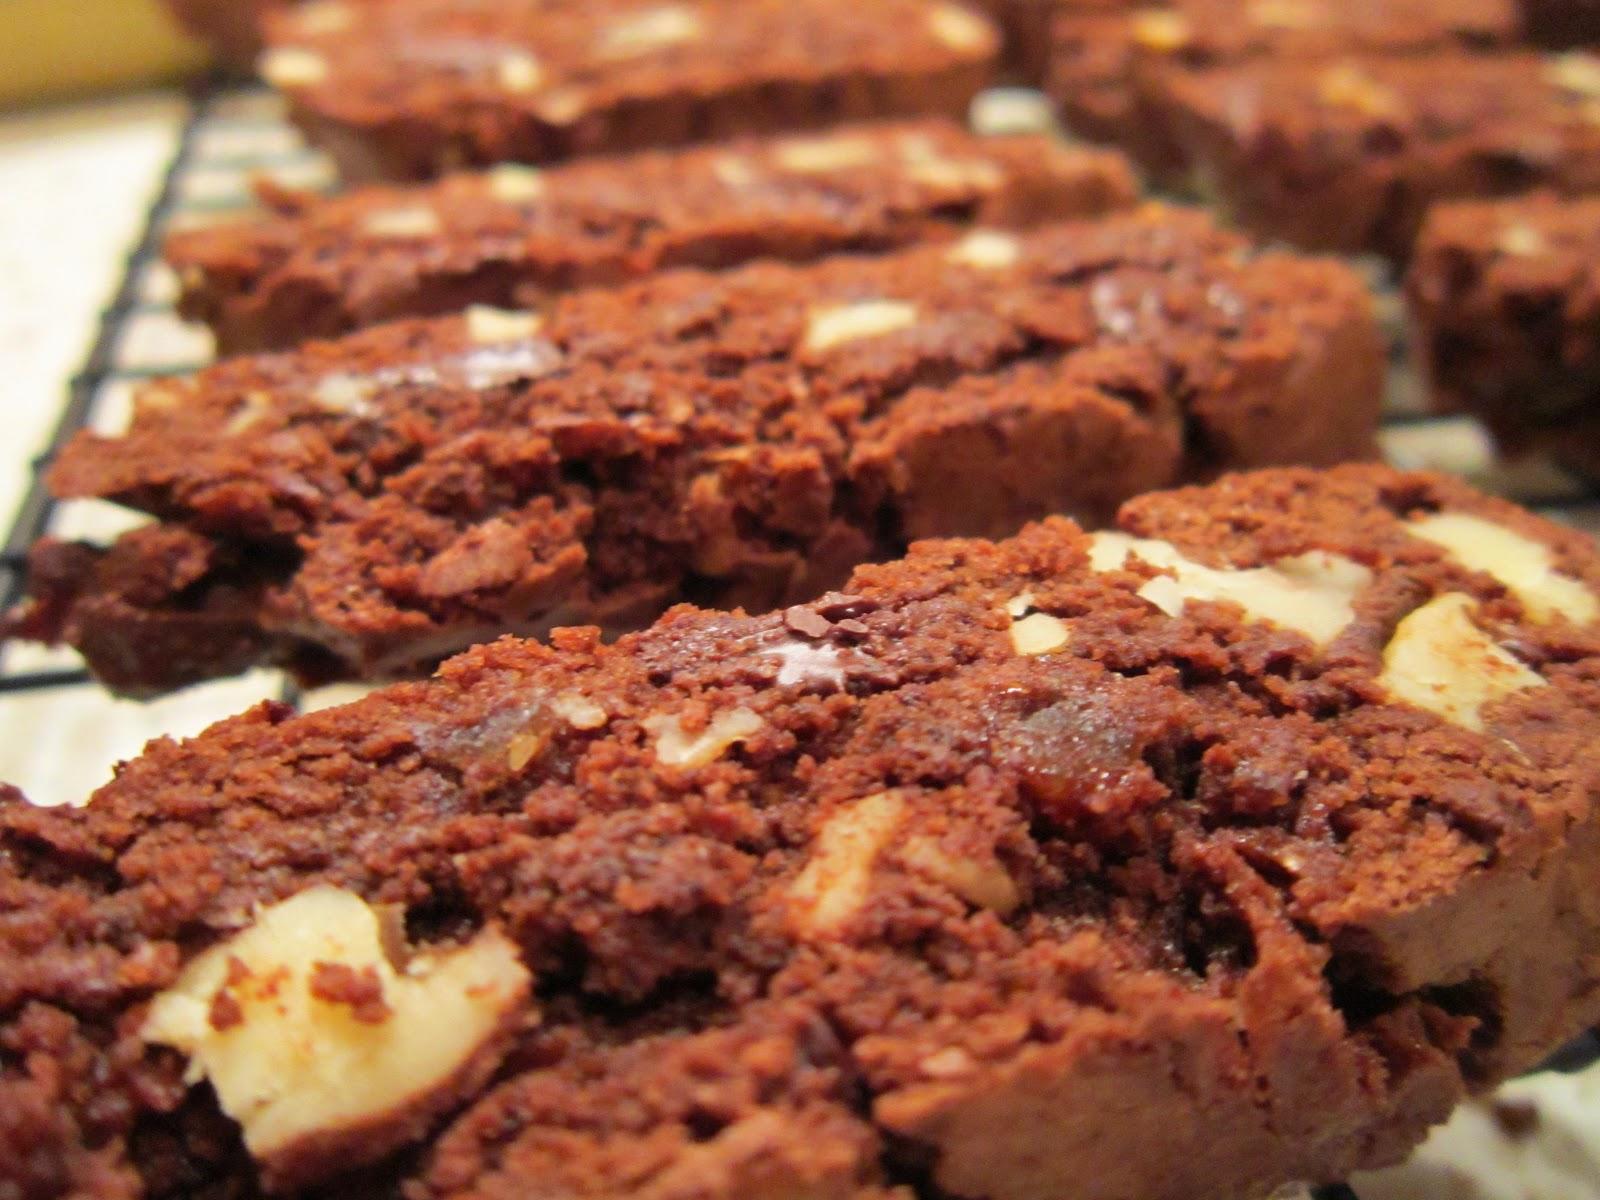 The Italian Next Door: Double Dark Chocolate and Ginger Biscotti